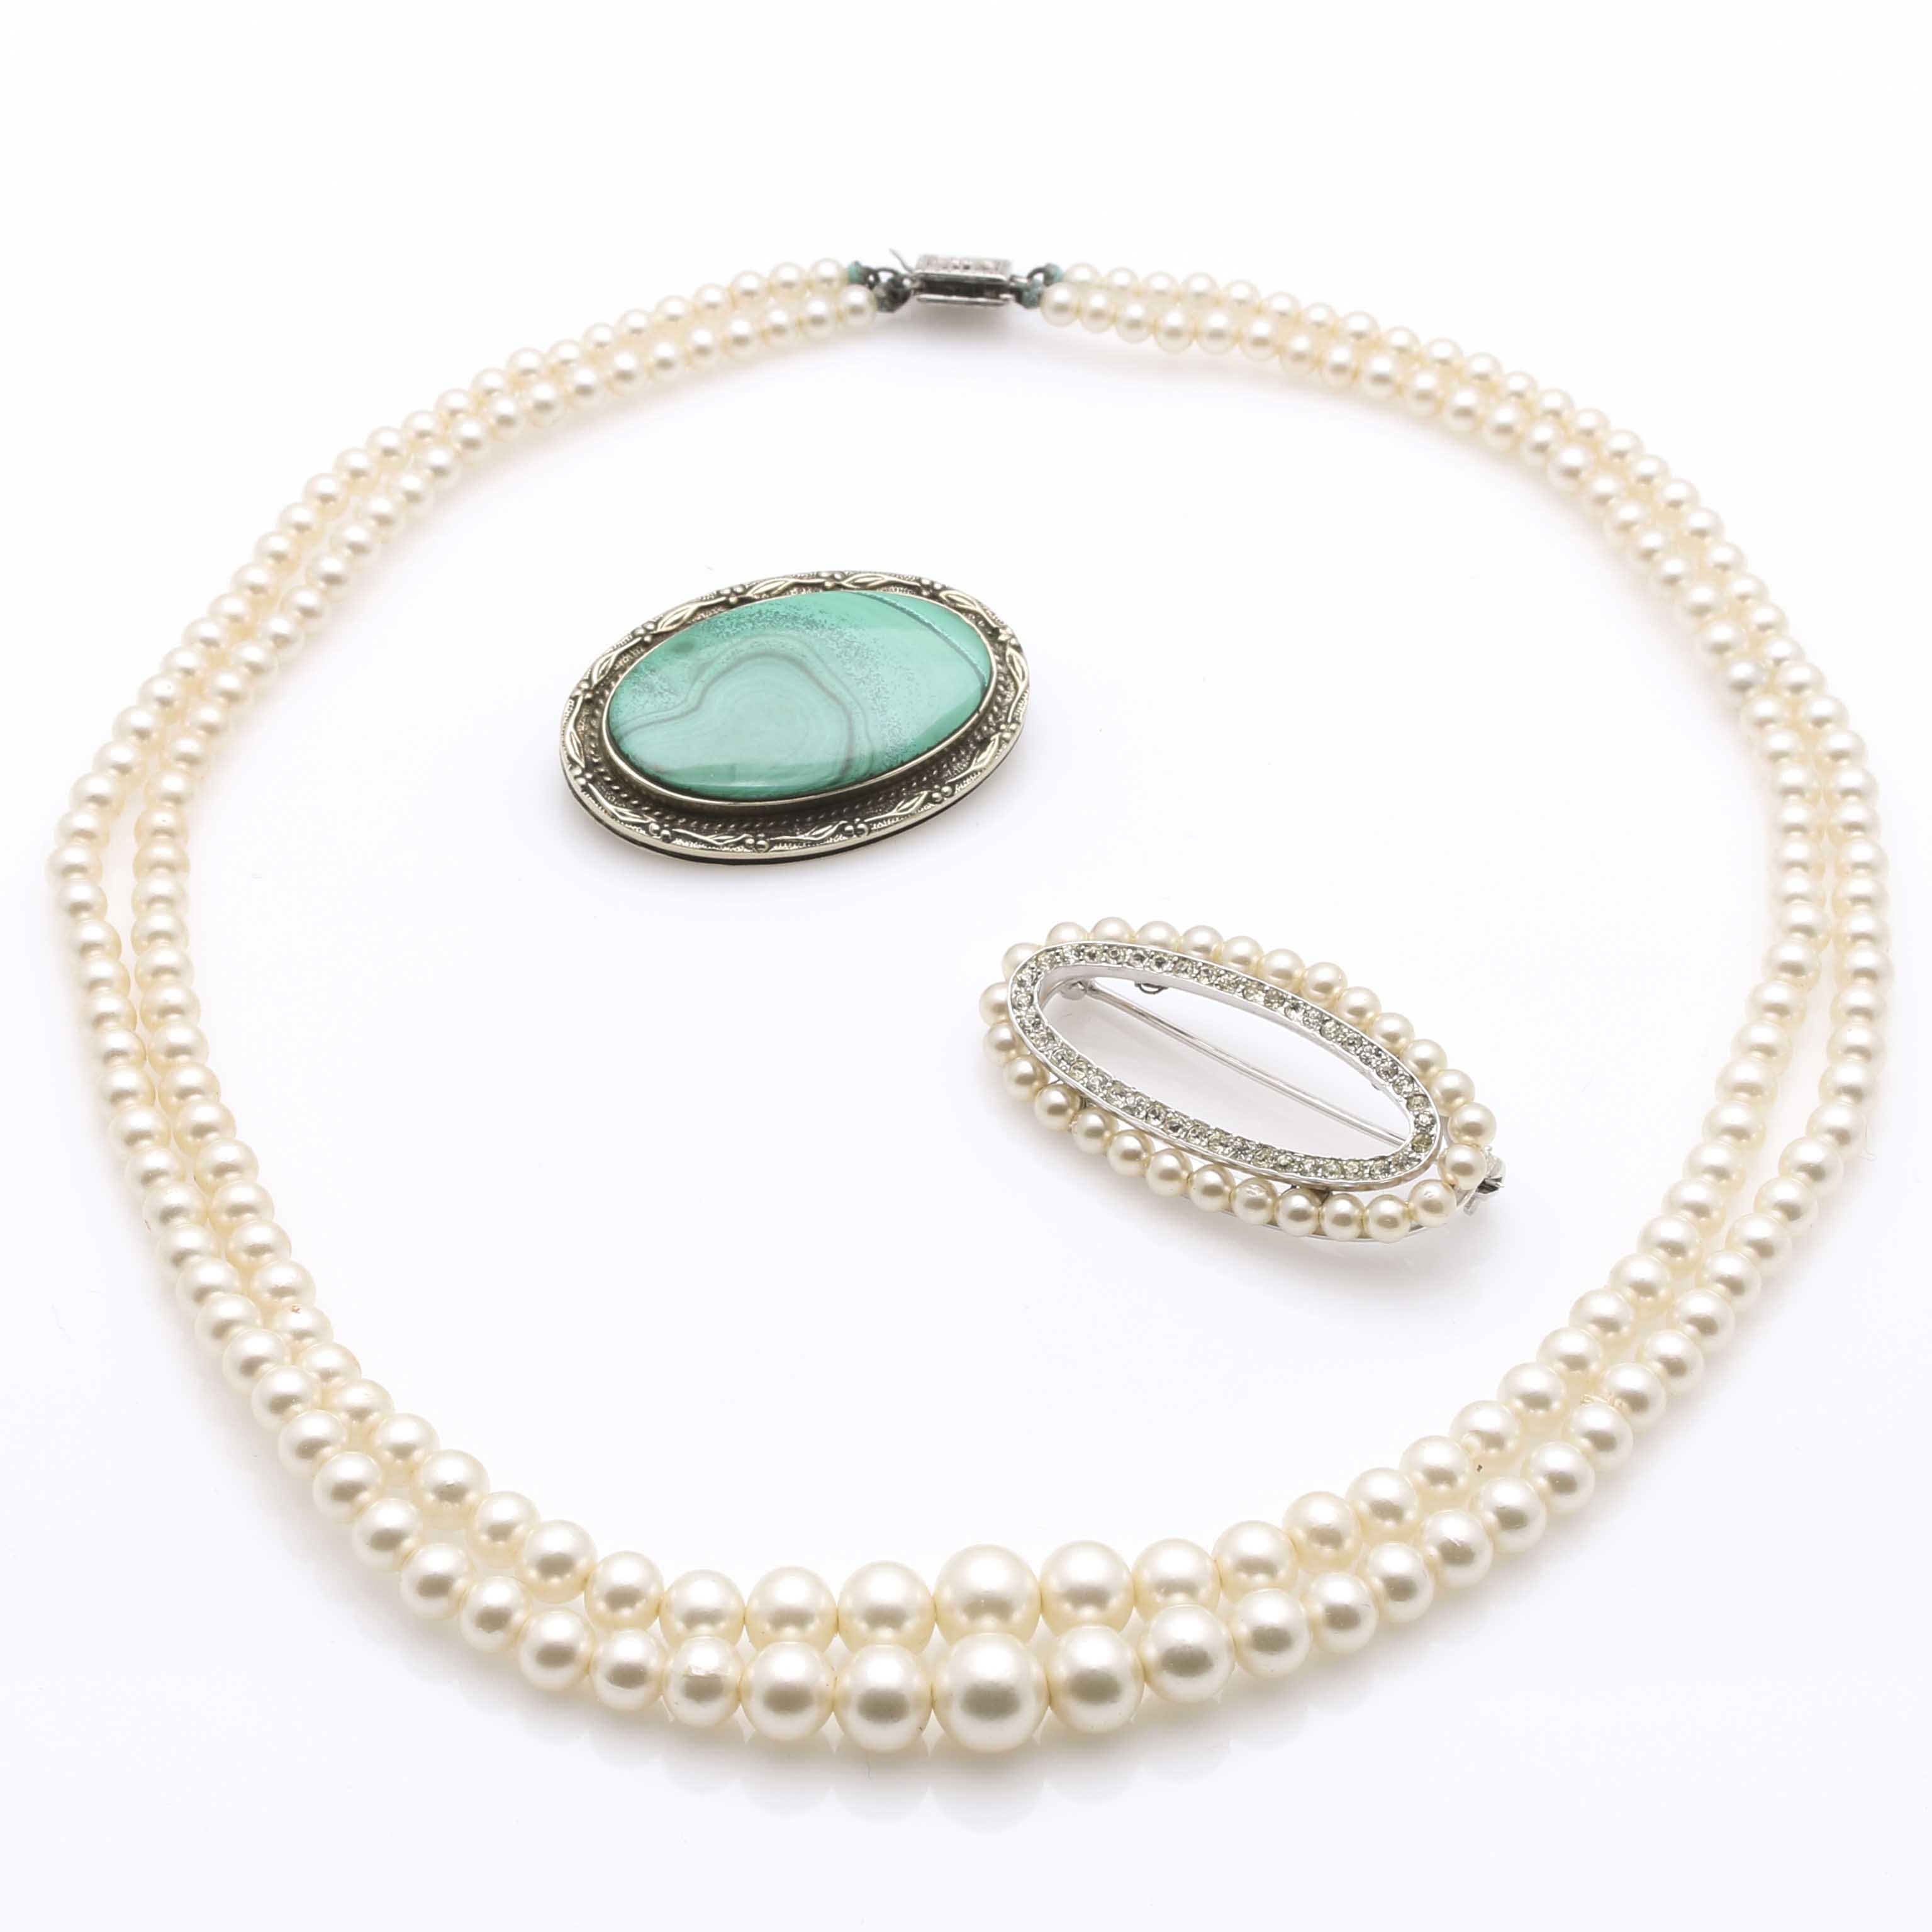 Trifari Pearl Brooch and Faux Diamond and Malachite Stone Jewelry